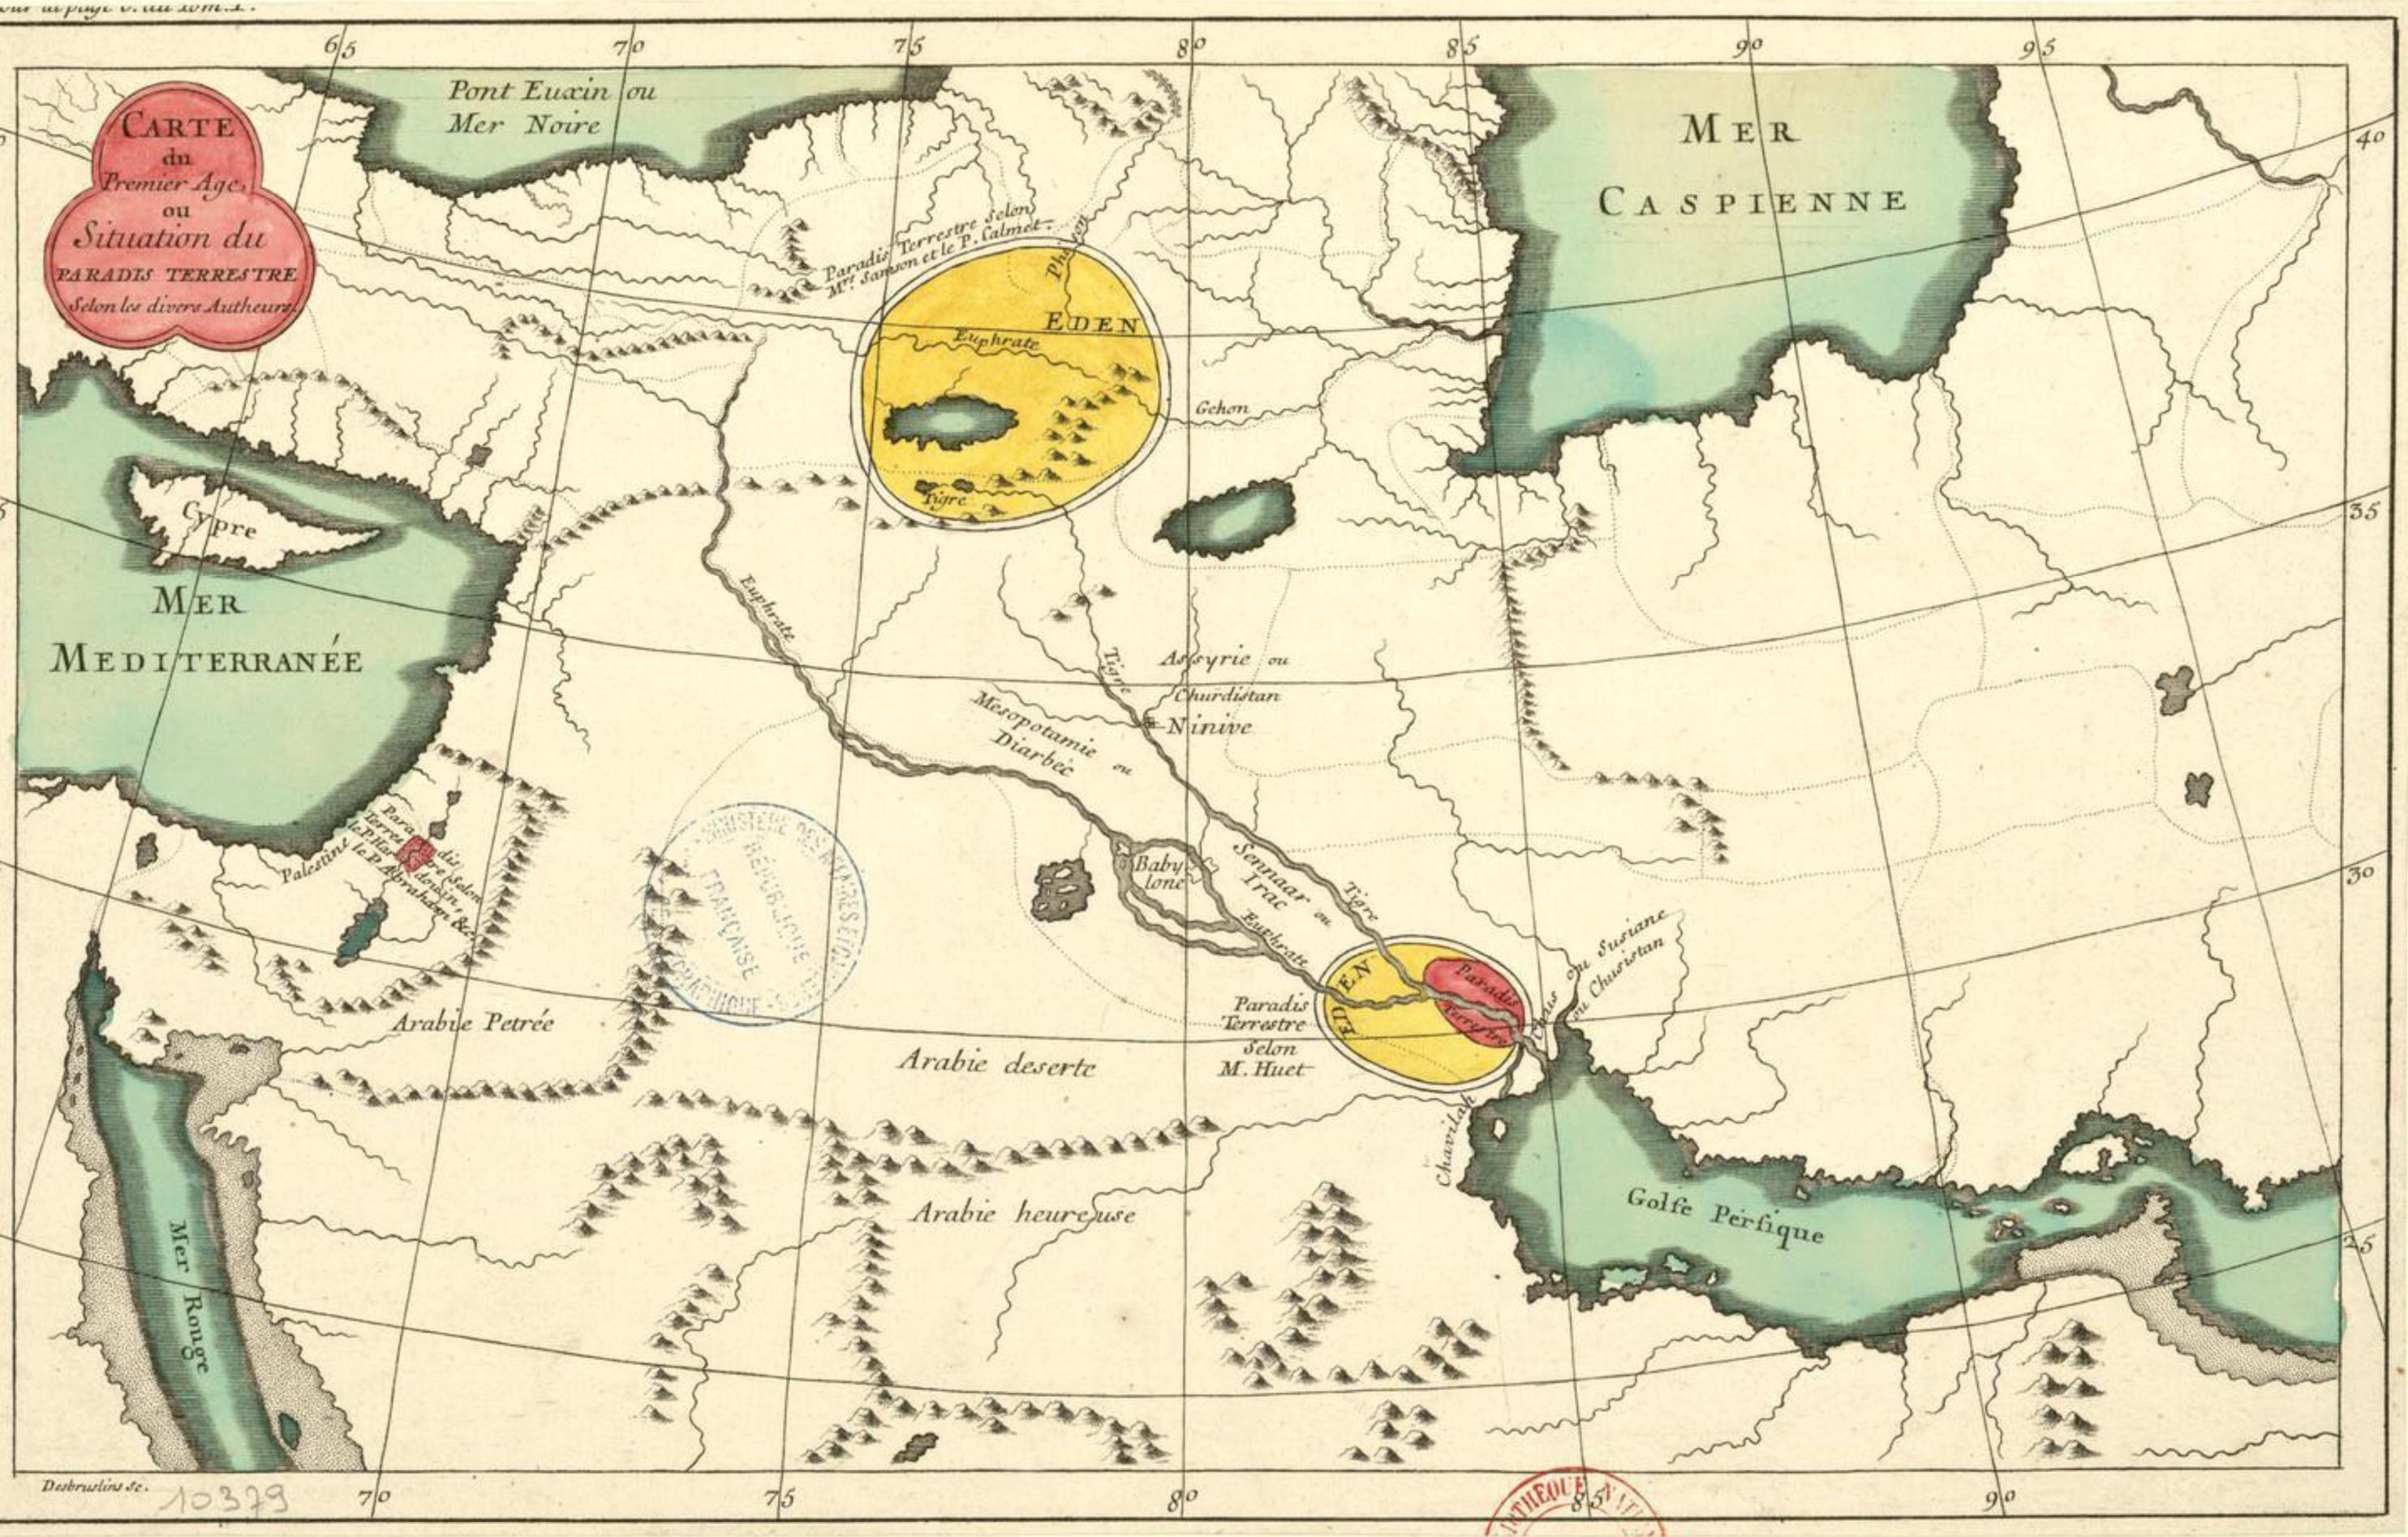 Paradis Terrestre by Desbrulins, F. 1700-1799 source Bibliothèque nationale de France